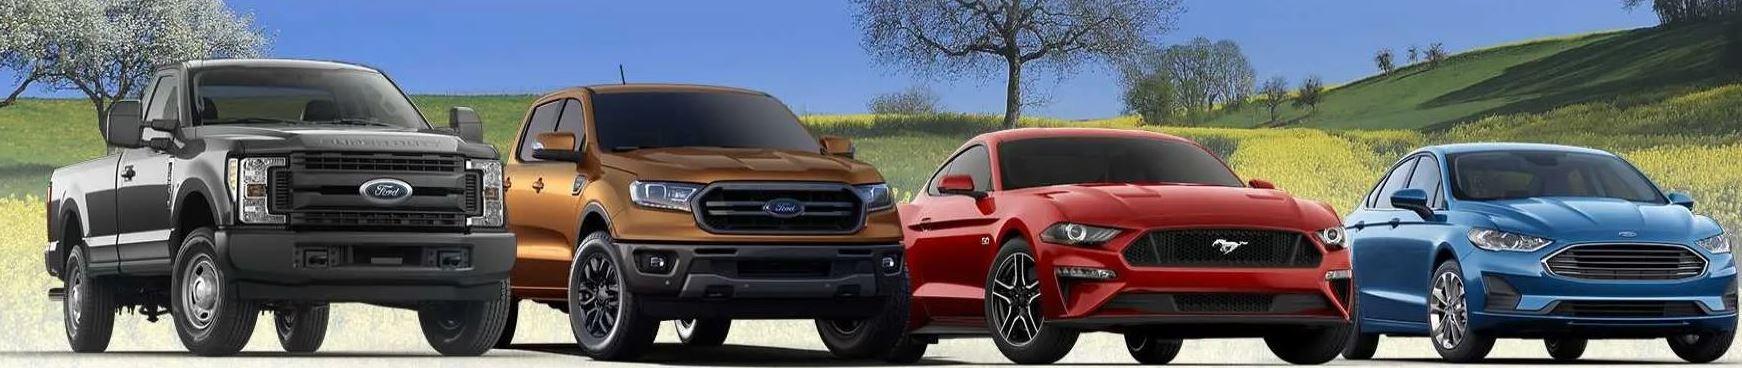 Help me find a vehicle